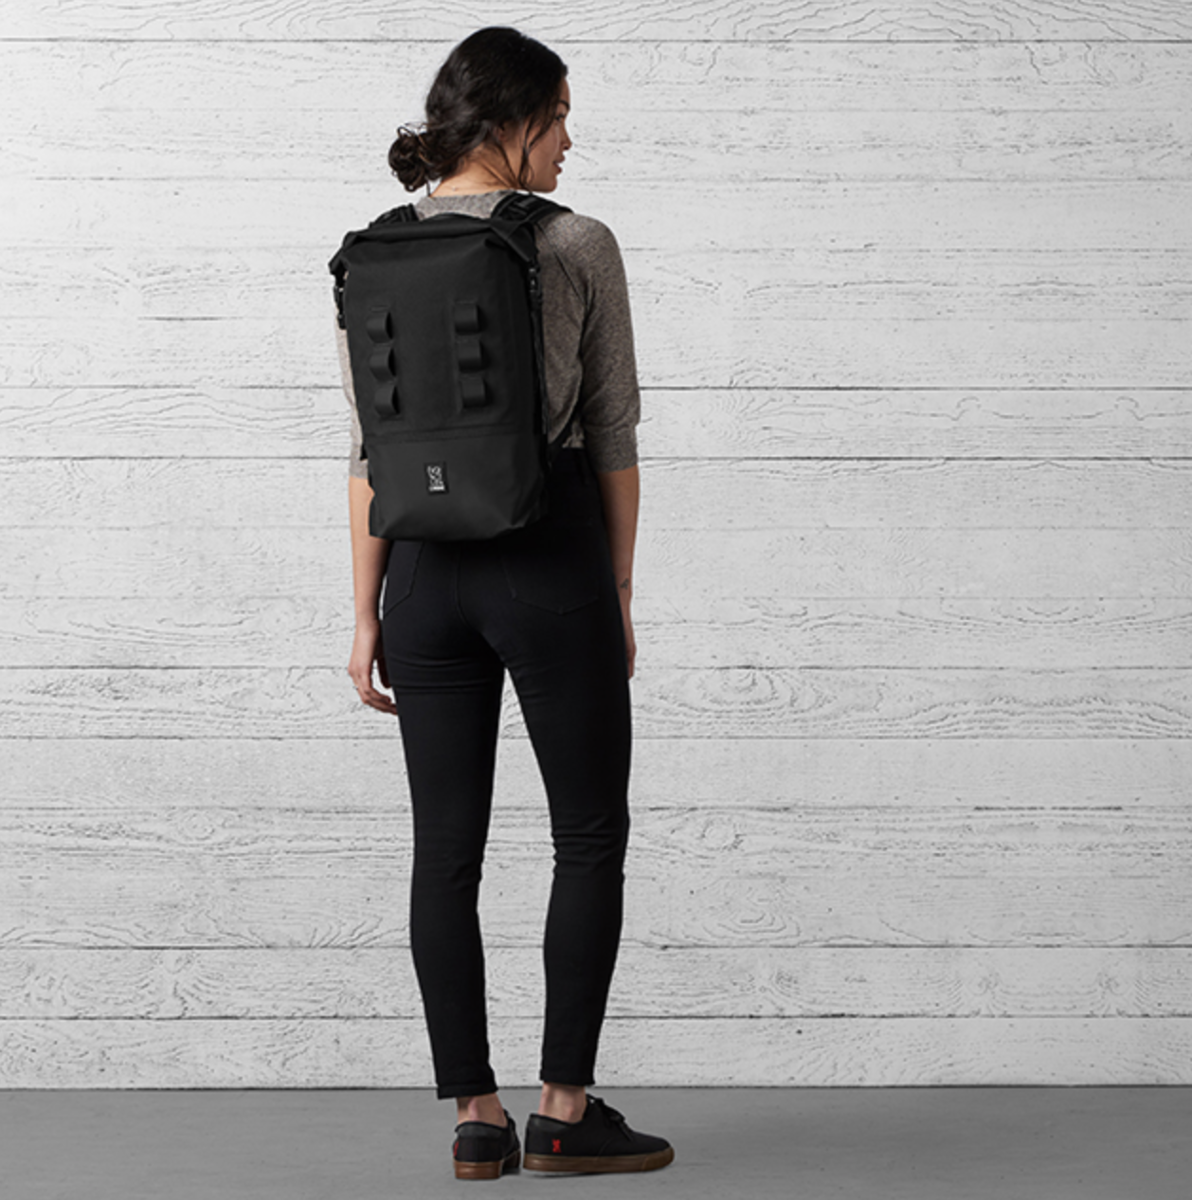 f:id:thebackpack:20190521182352p:plain